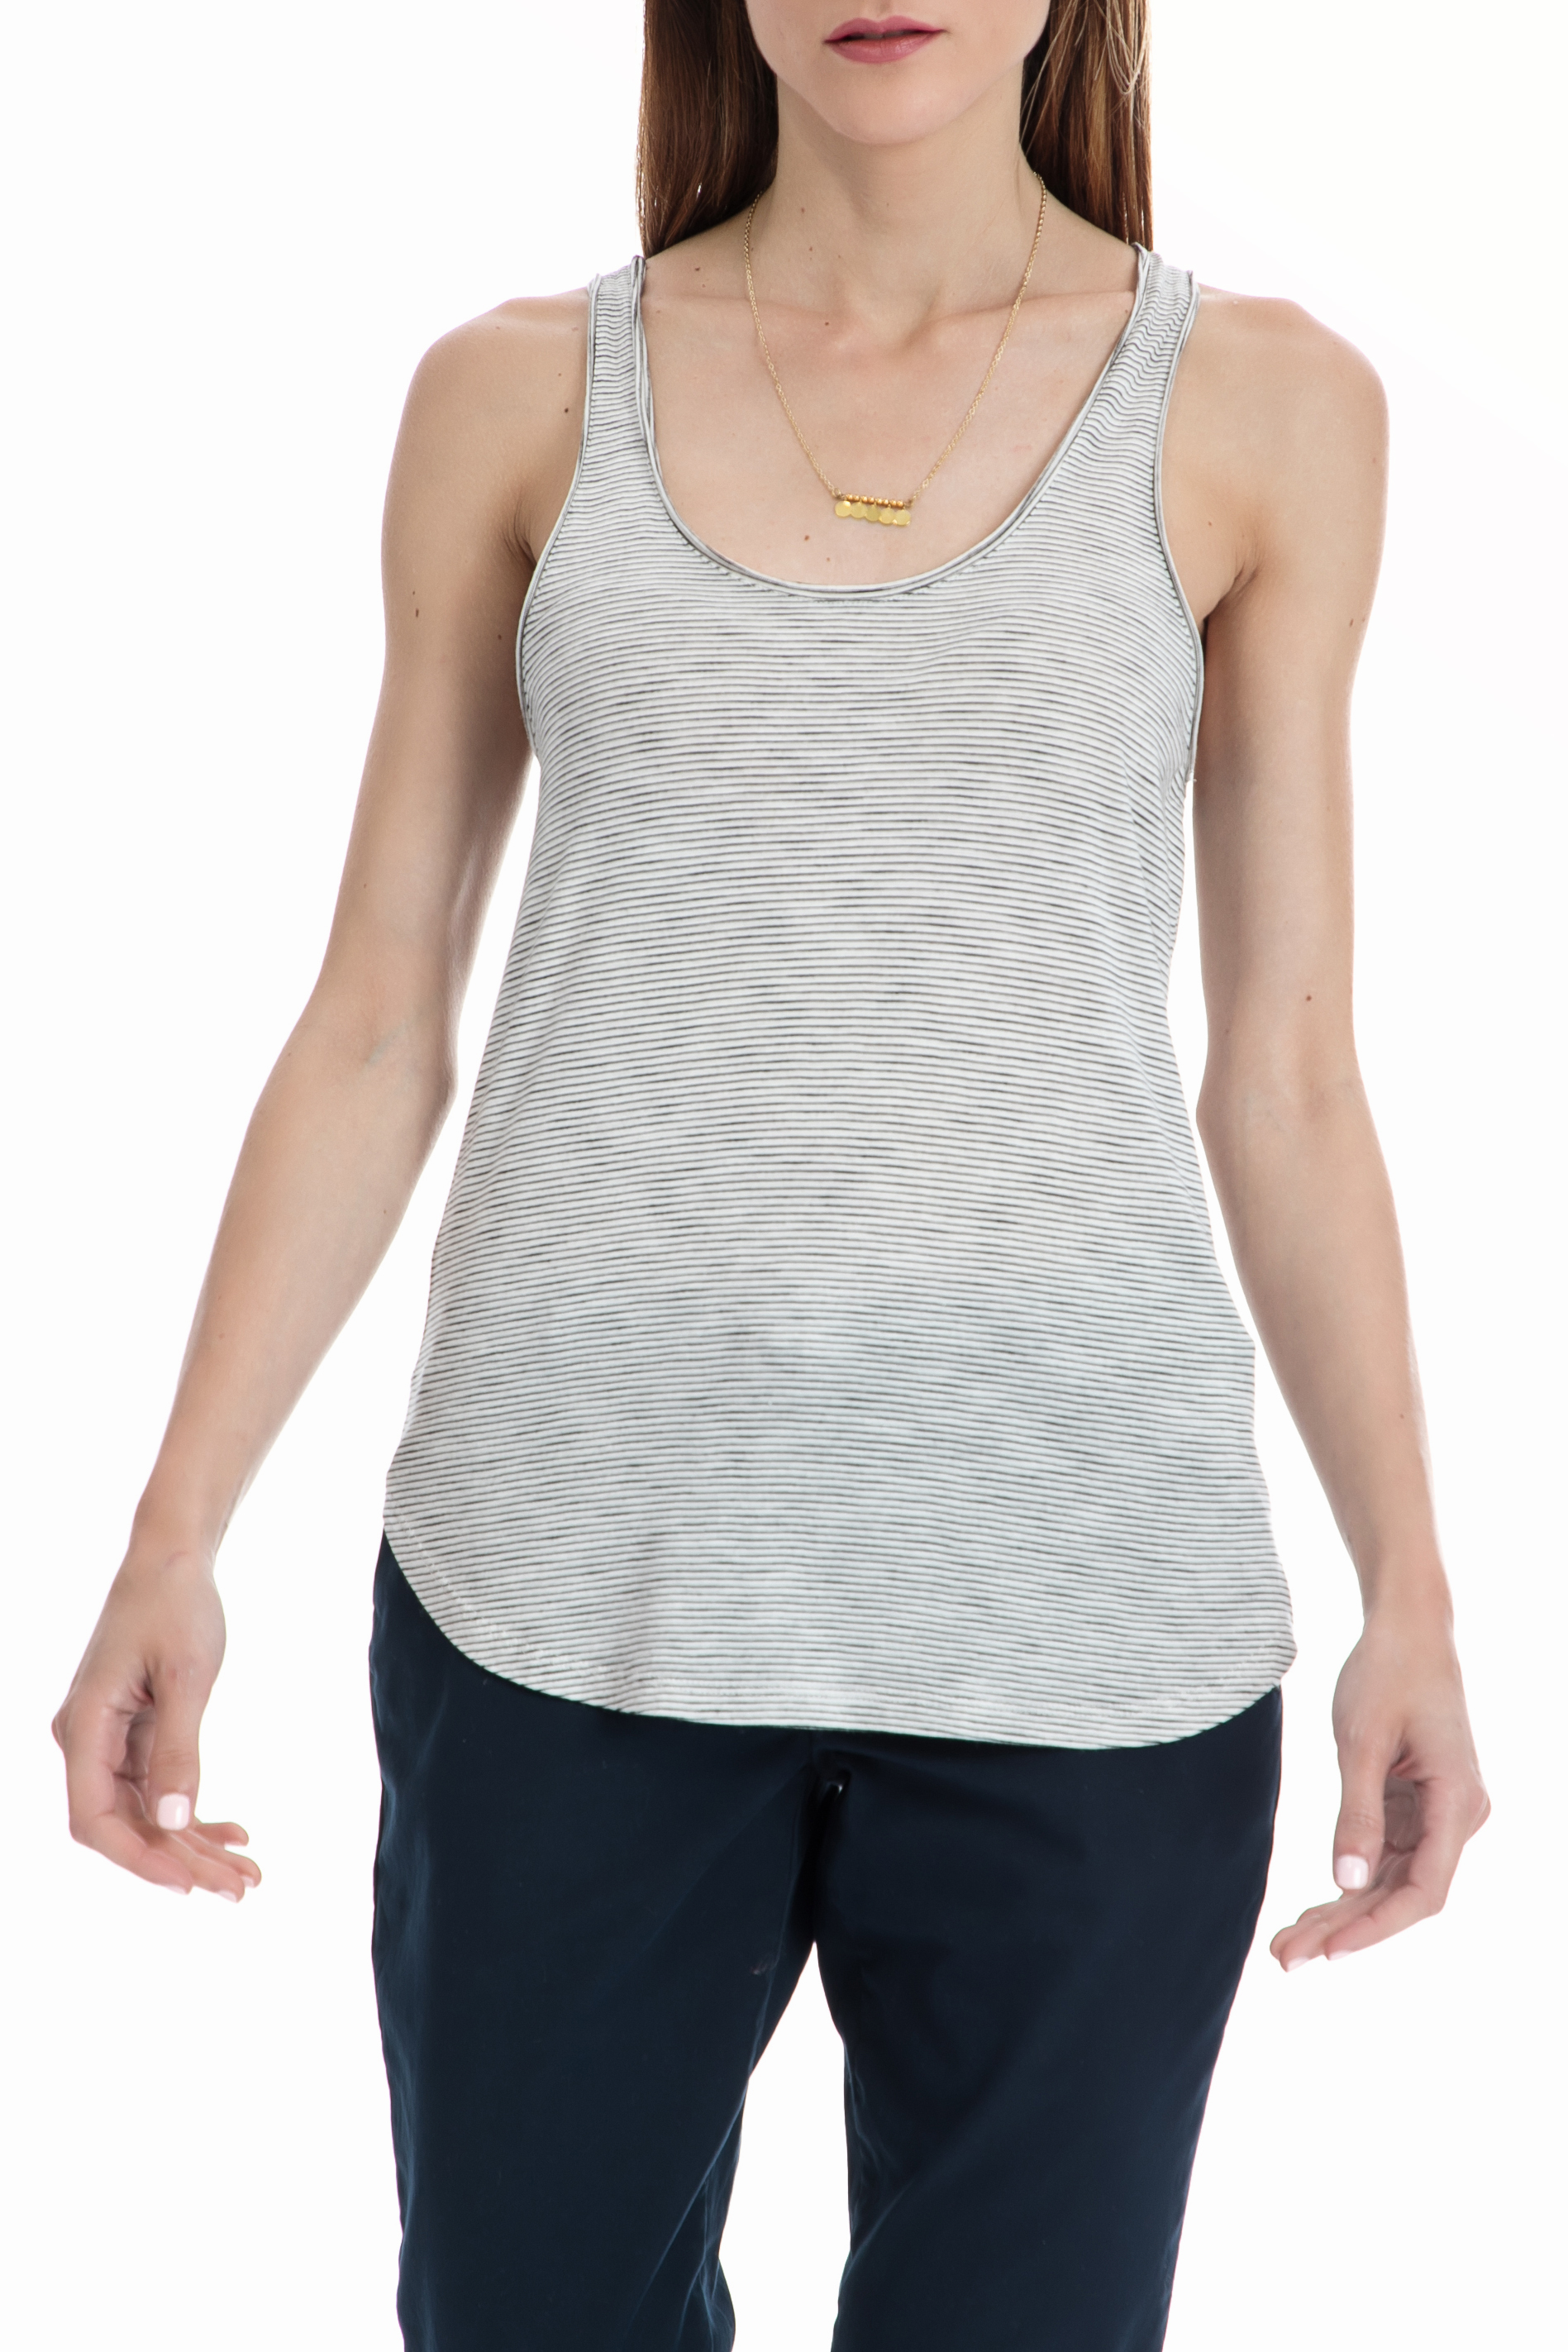 SCOTCH & SODA - Γυναικεία αμάνικη μπλούζα MAISON SCOTCH λευκή-μαύρη γυναικεία ρούχα μπλούζες αμάνικες